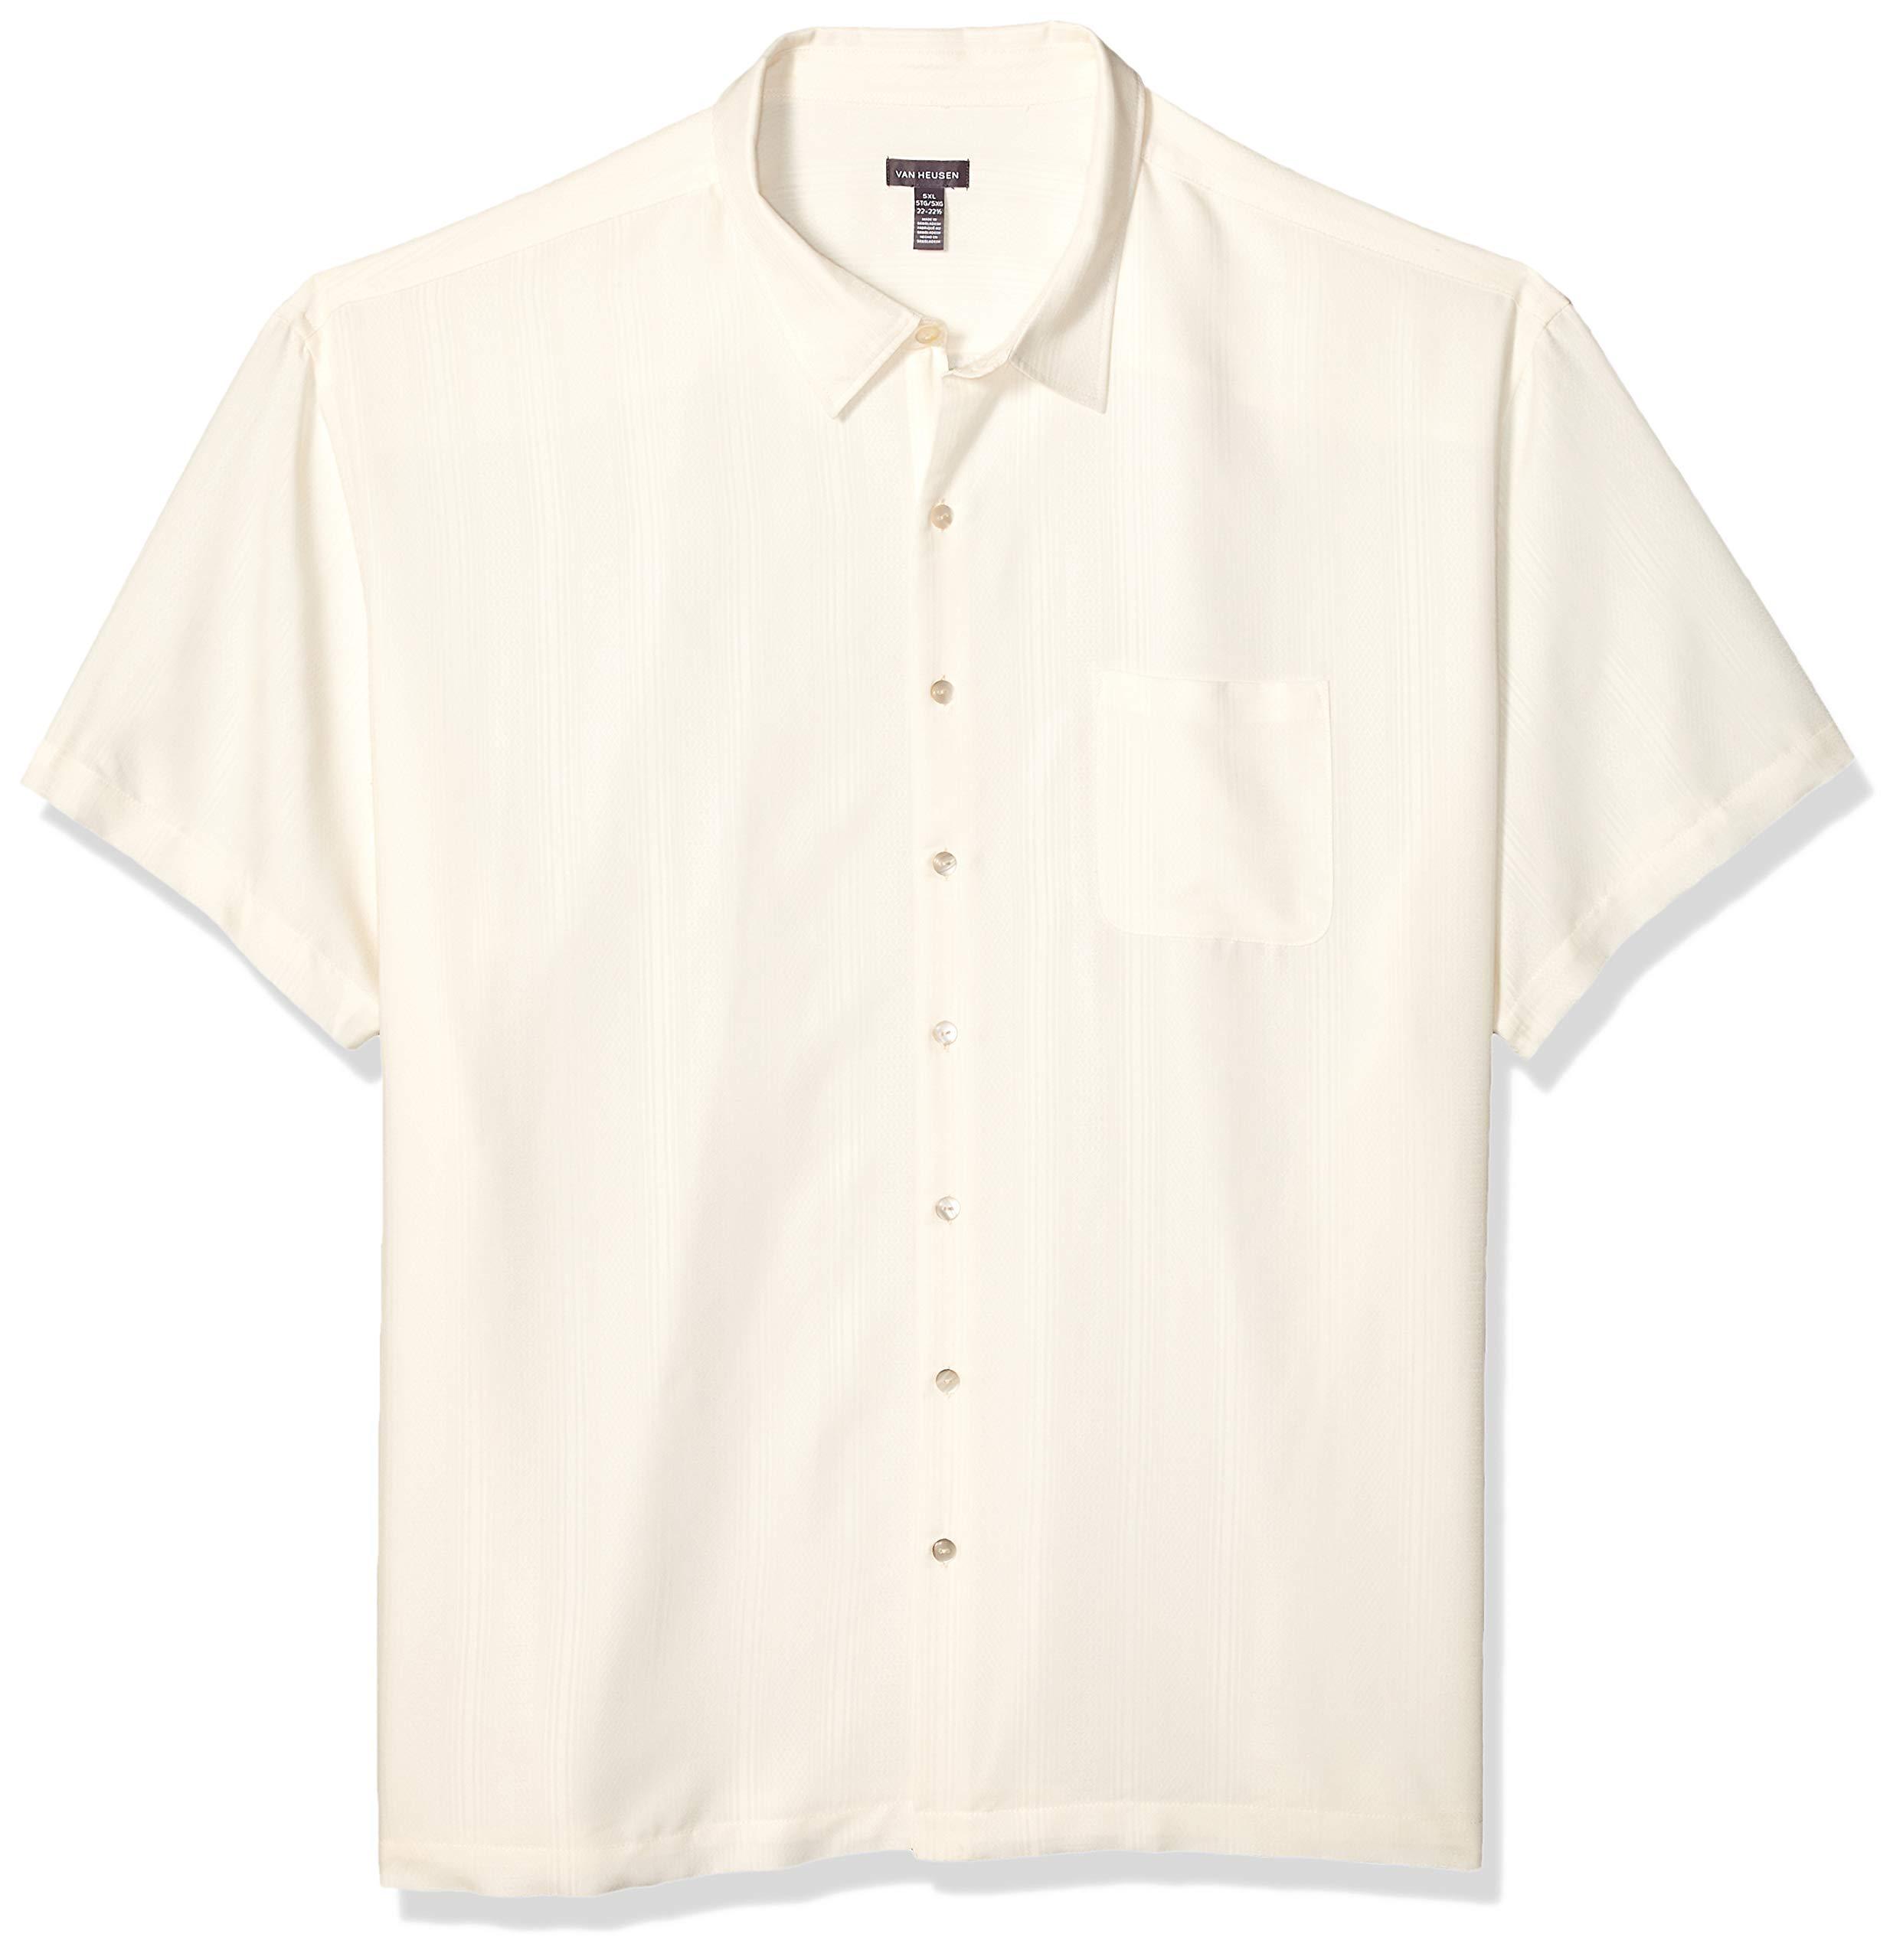 Van Heusen Men's Big and Tall Air Short Sleeve Button Down Poly Rayon Stripe Shirt